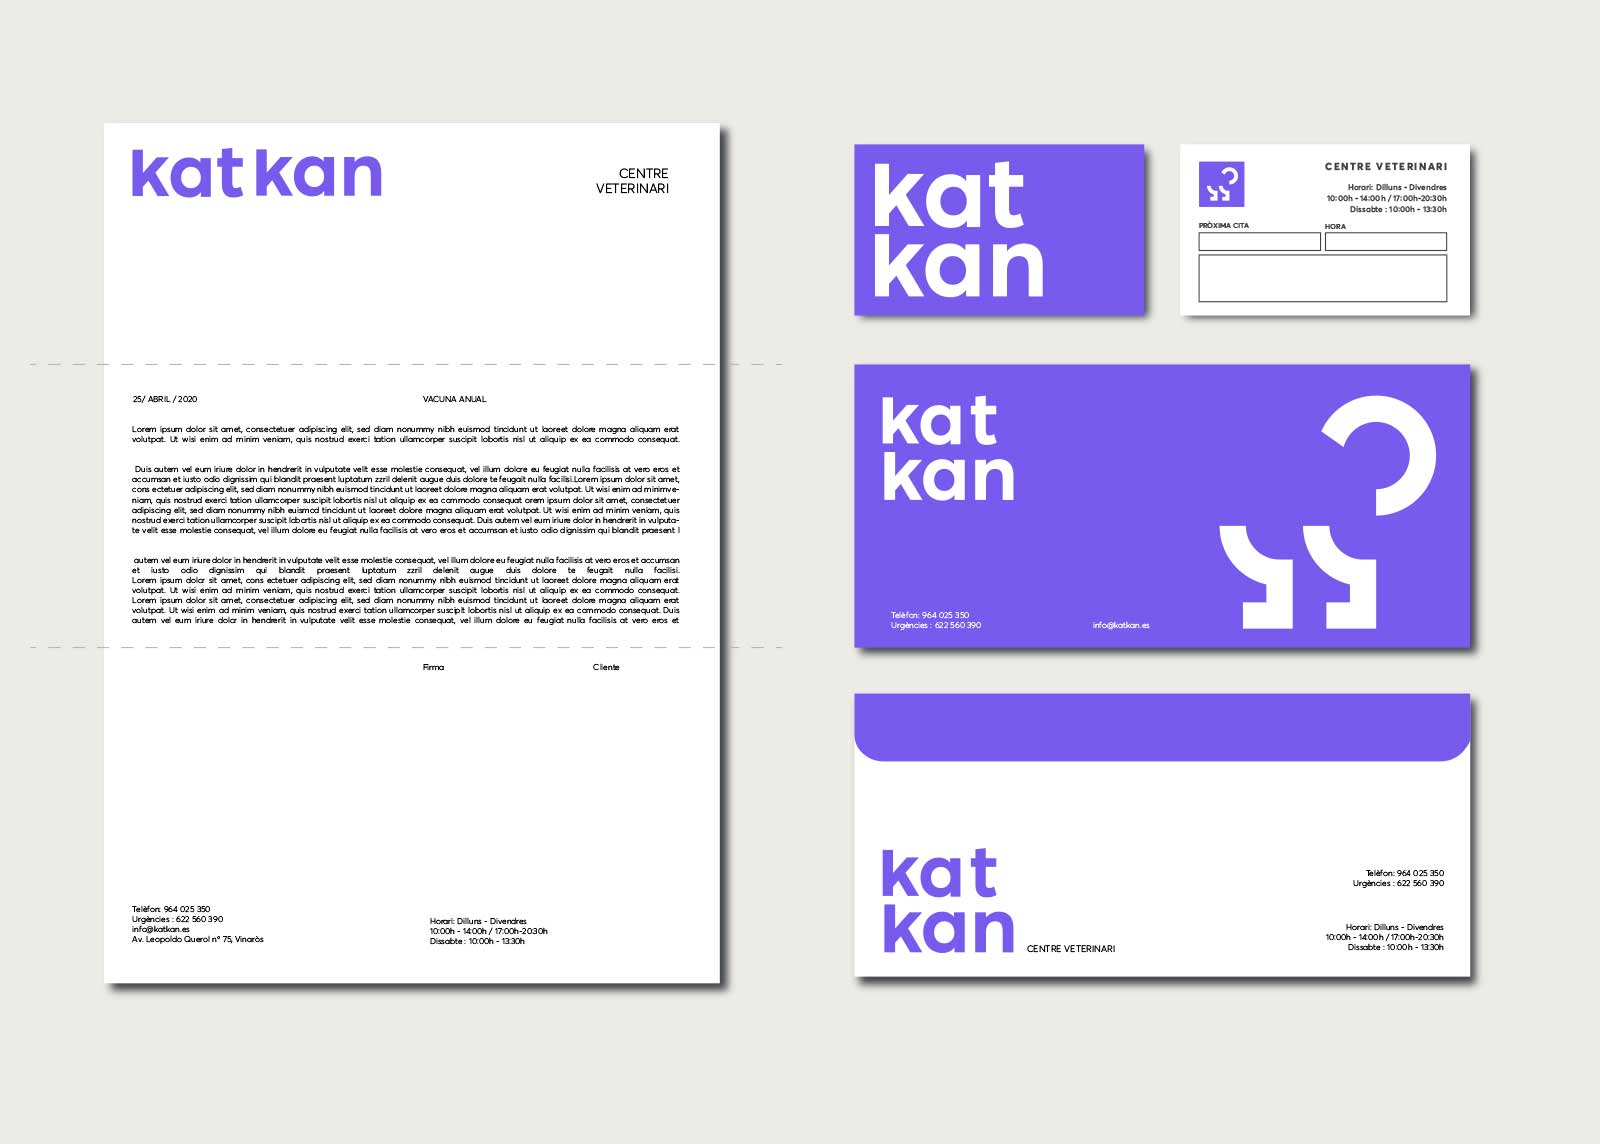 Kat Kan, Identidad corporativa, logotipo, papeleria corporativa